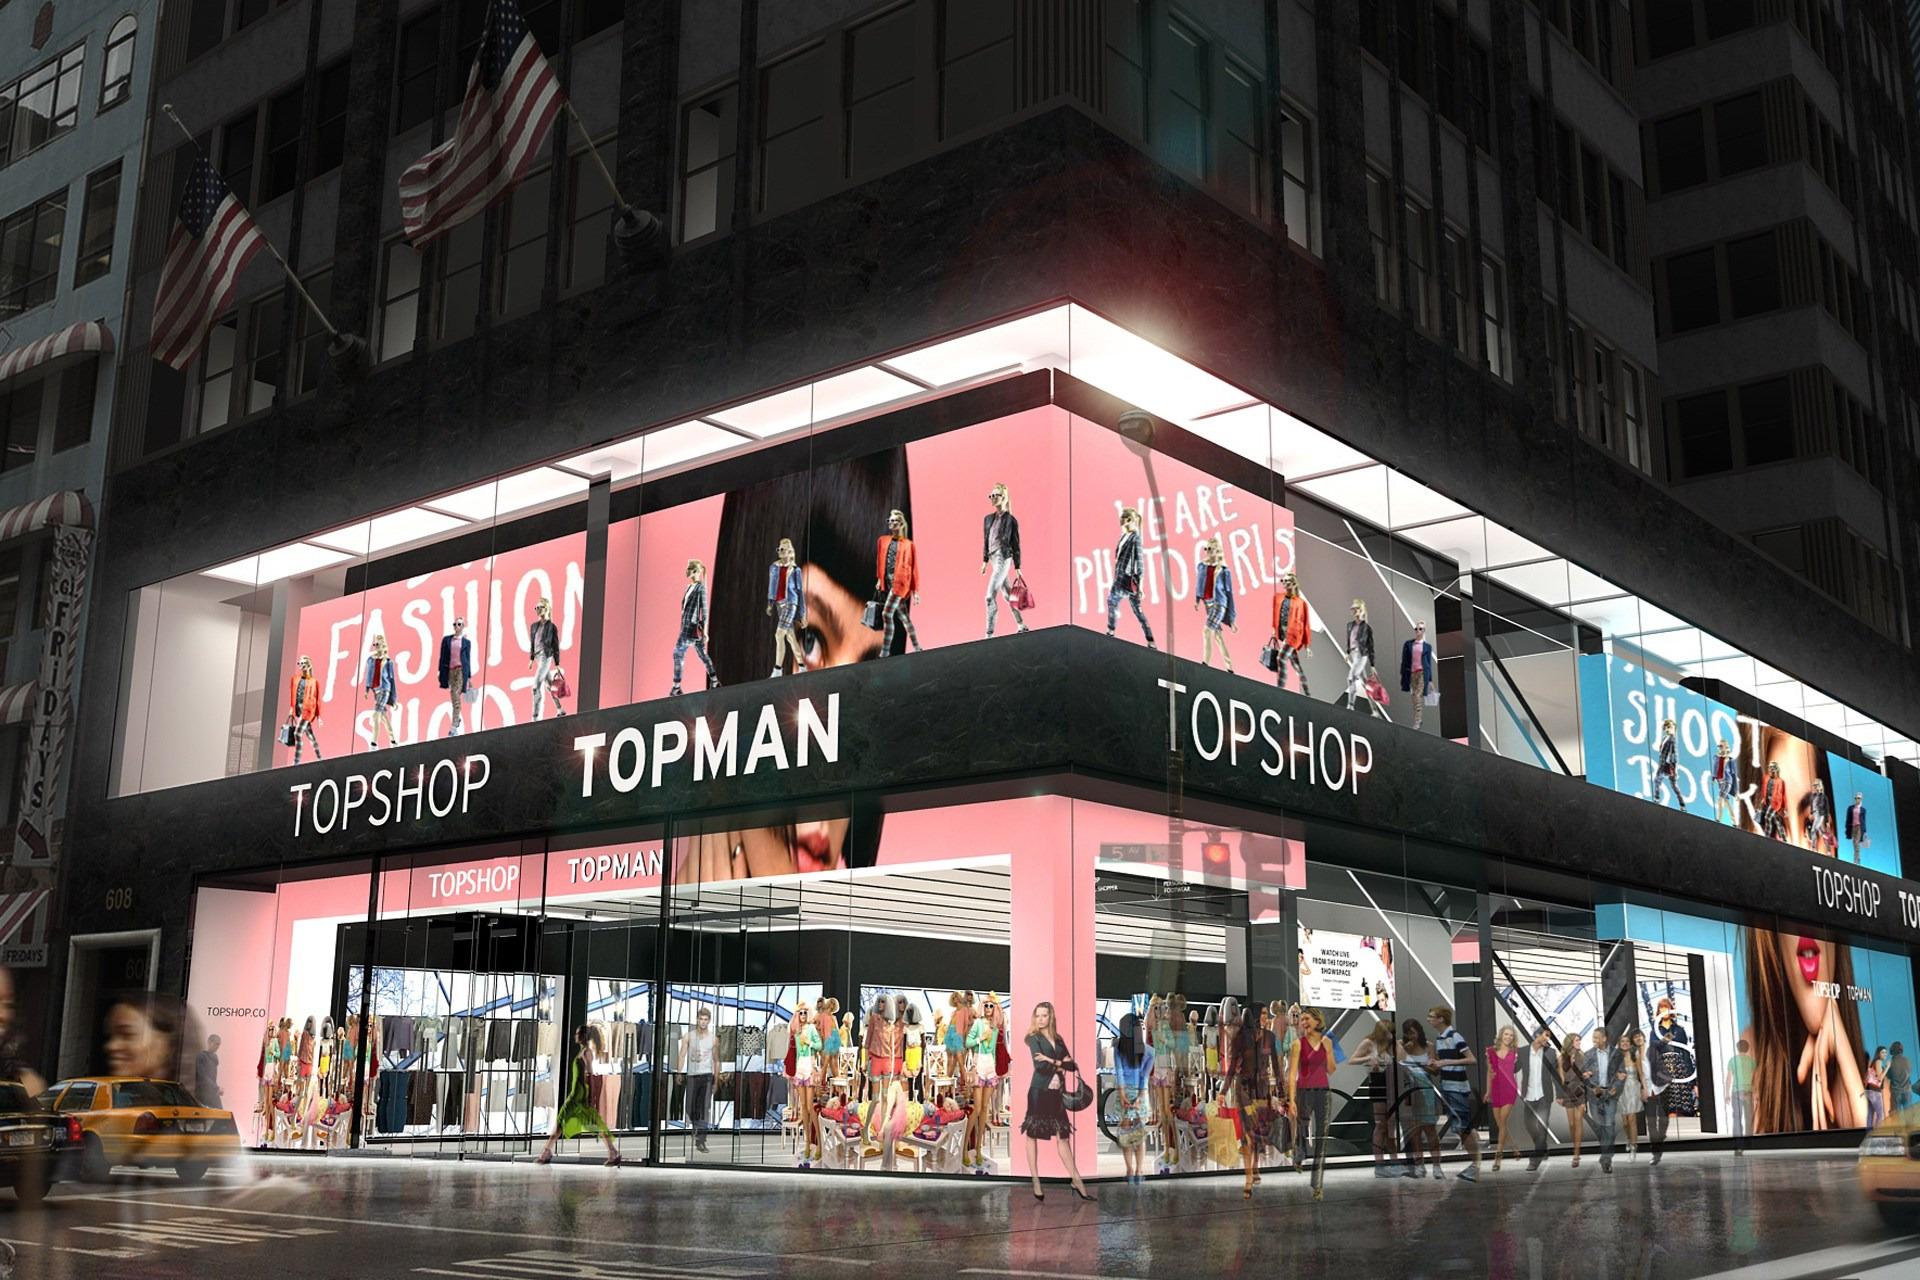 Topshop 王子街分店